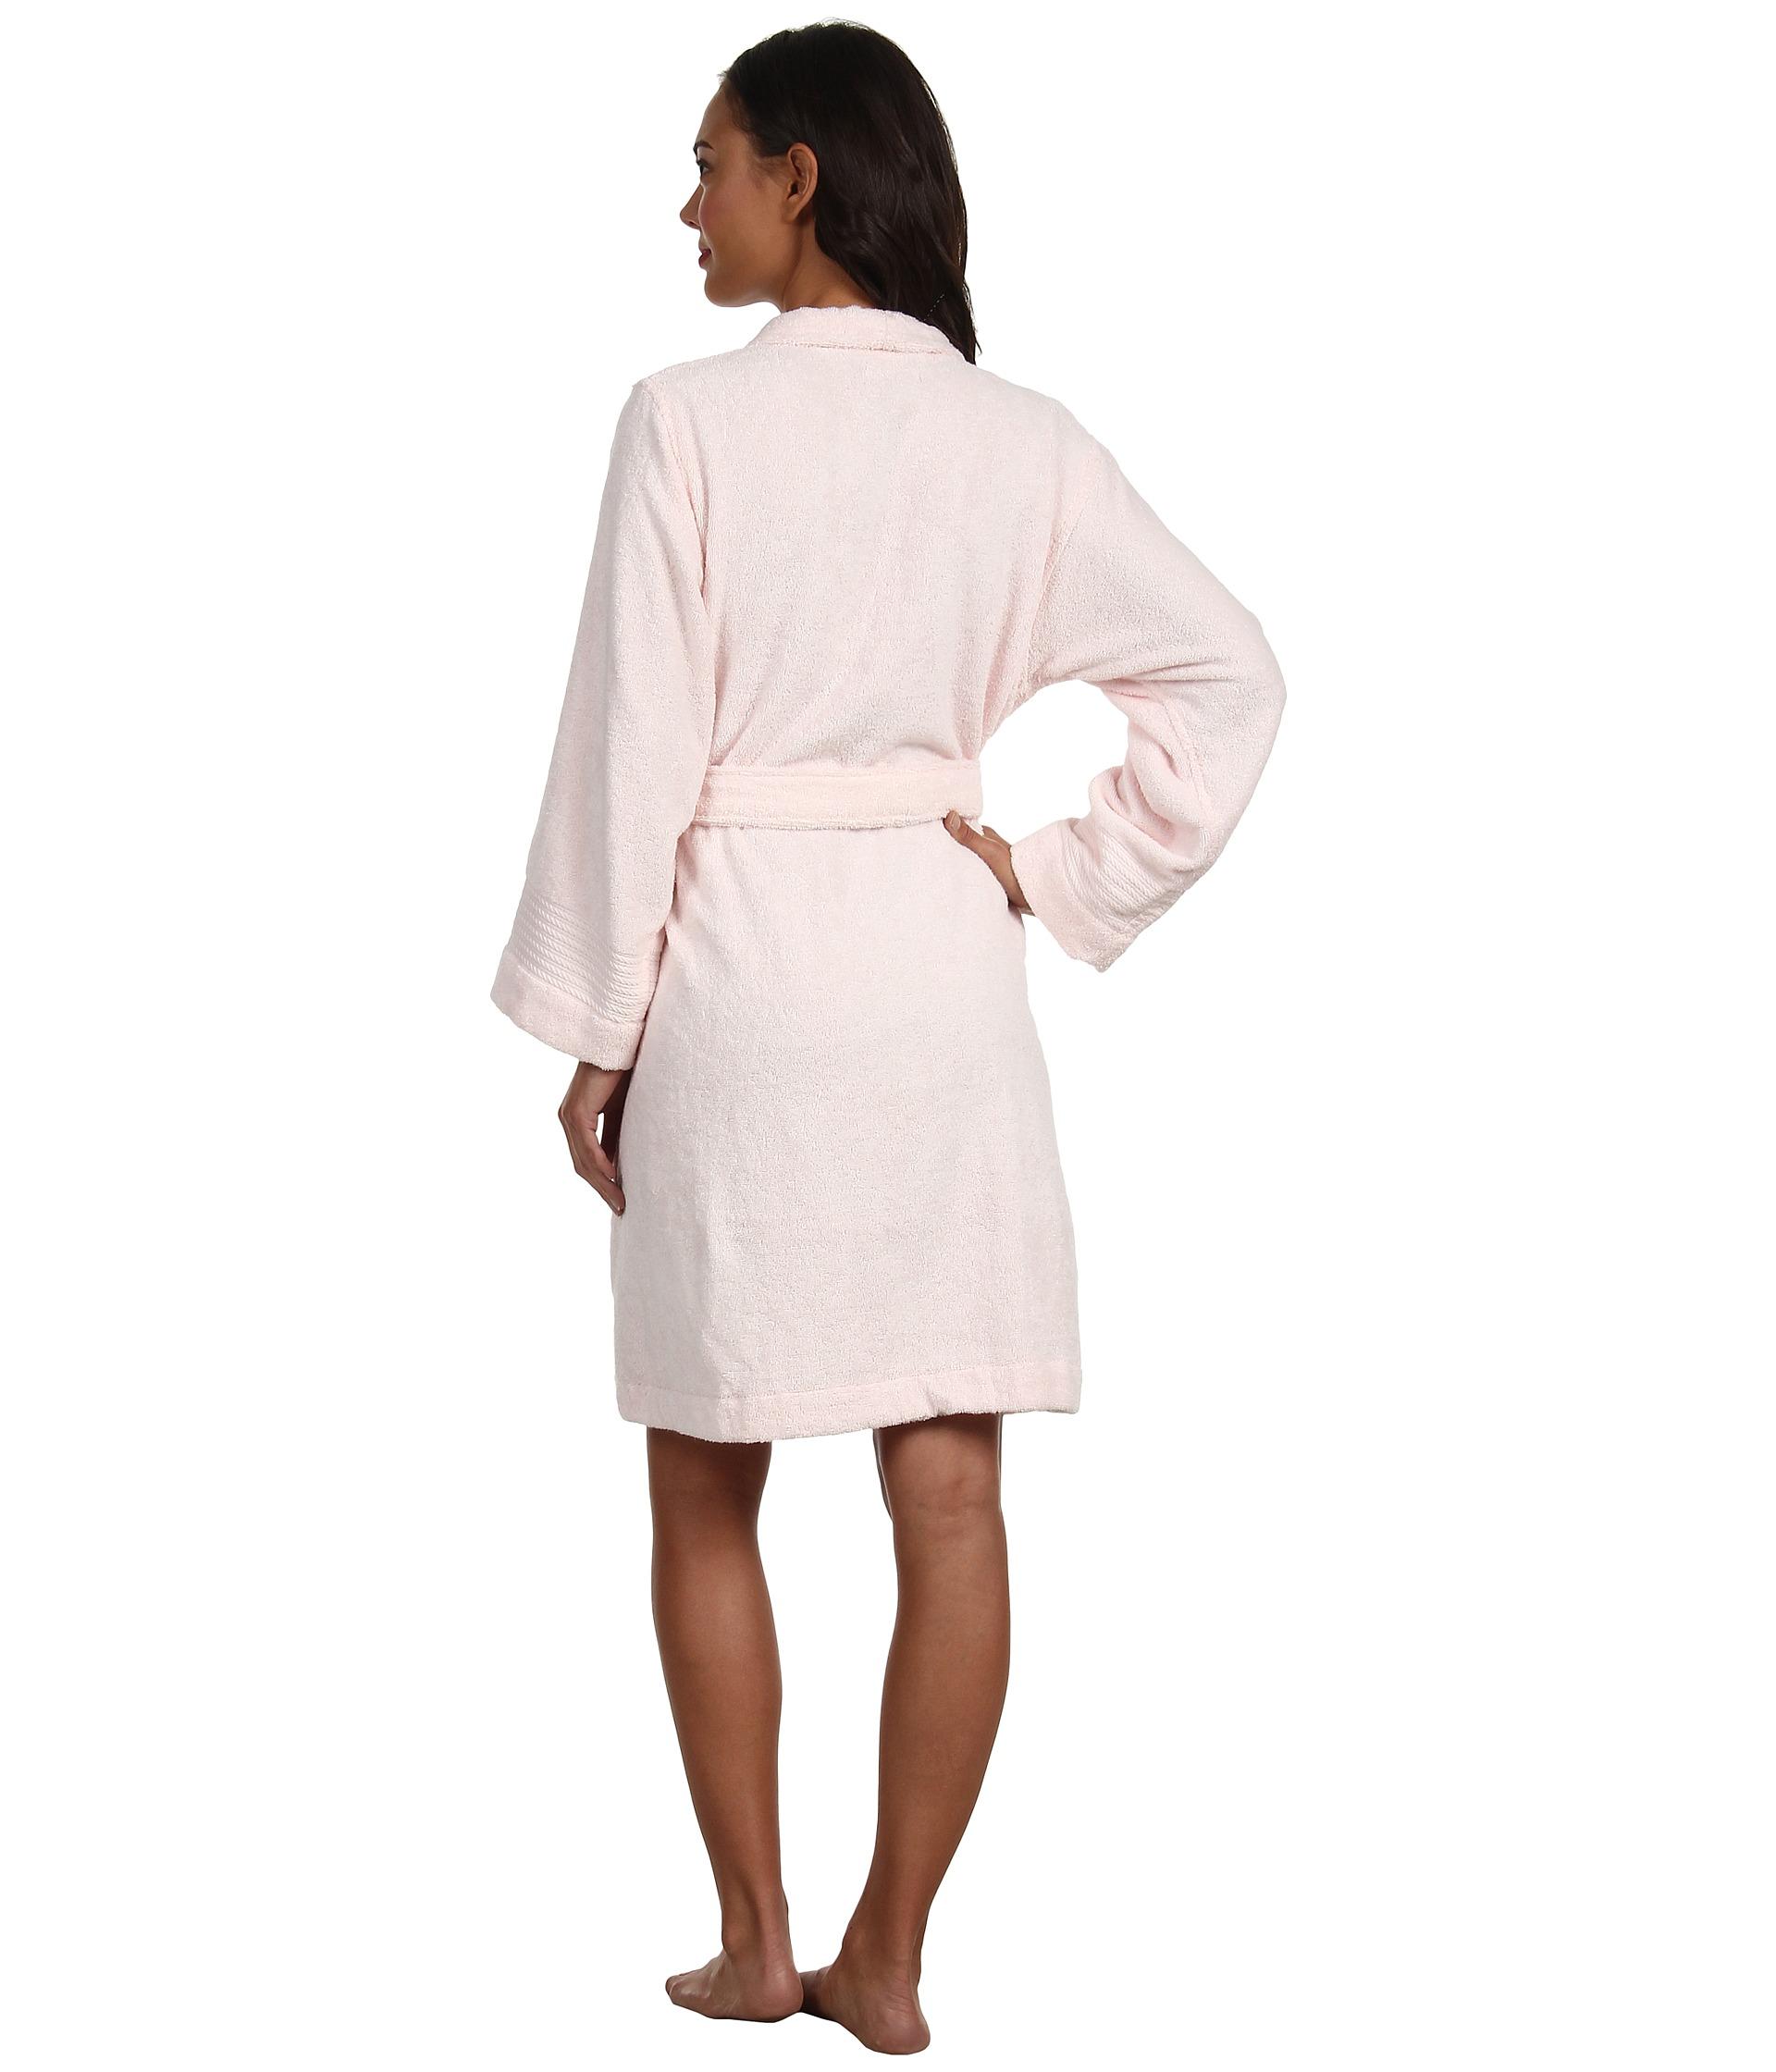 lauren ralph lauren greenwich woven terry robe at. Black Bedroom Furniture Sets. Home Design Ideas